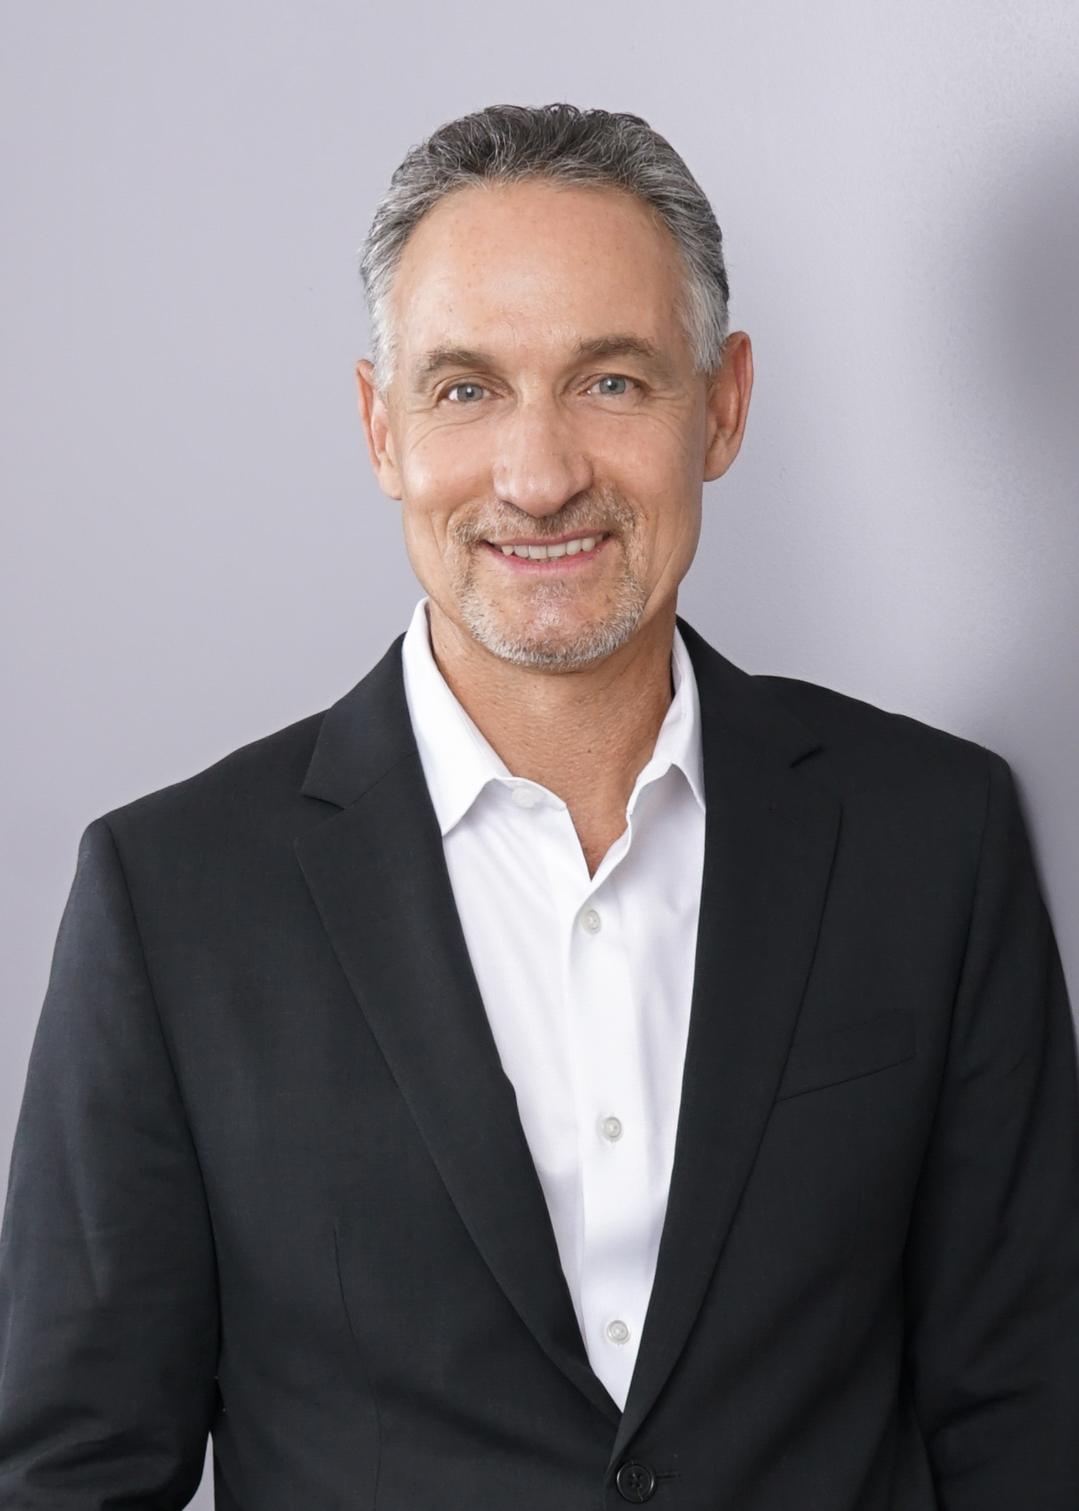 Bob Braham - CEO of Famous